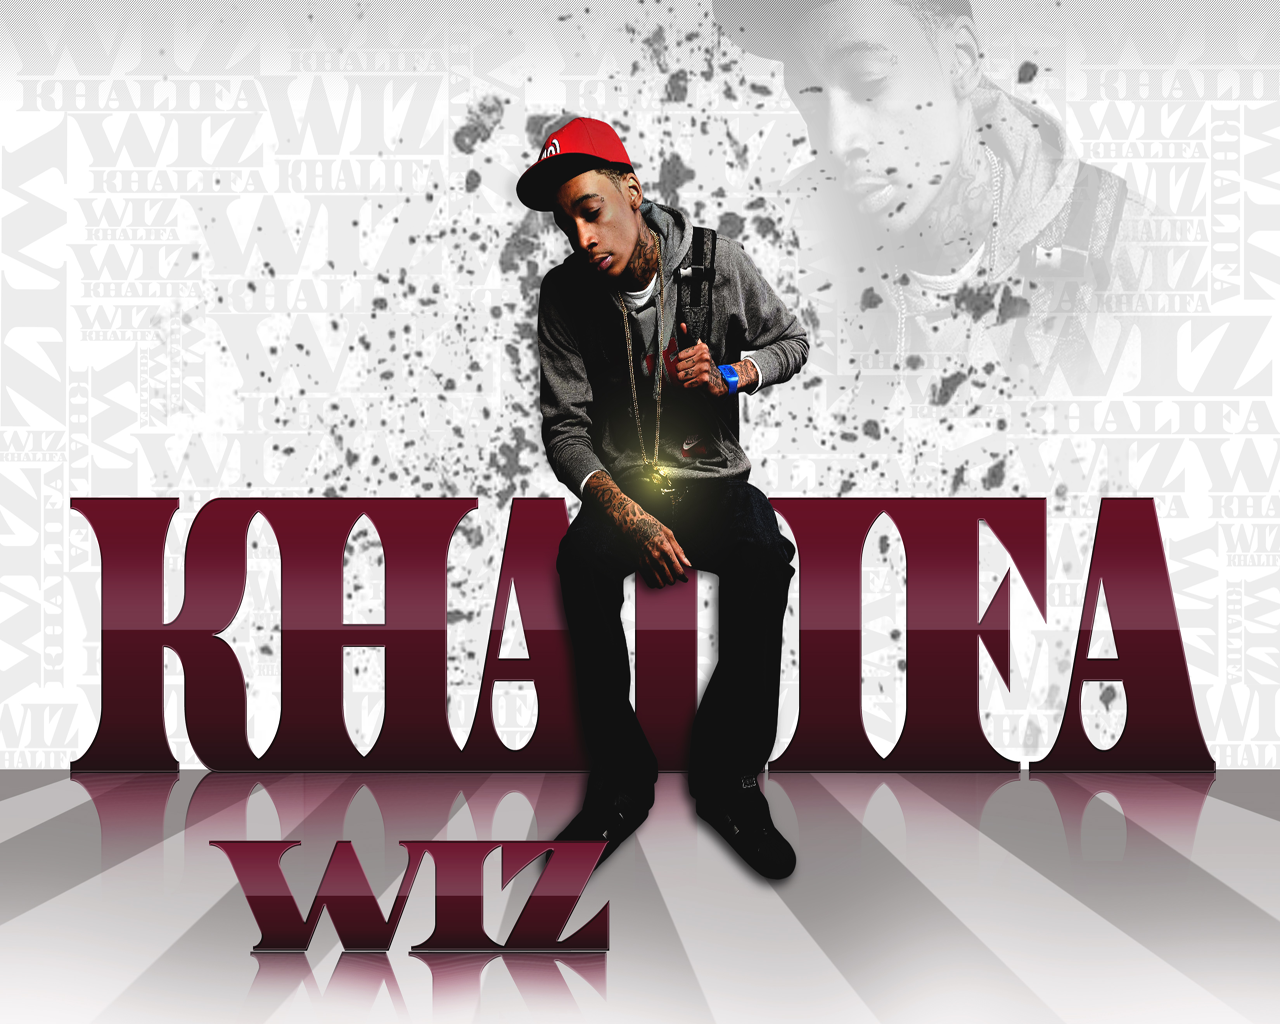 Wiz Khalifa Taylor Gang Die Wallpaper 1280x1024 Full HD Wallpapers 1280x1024